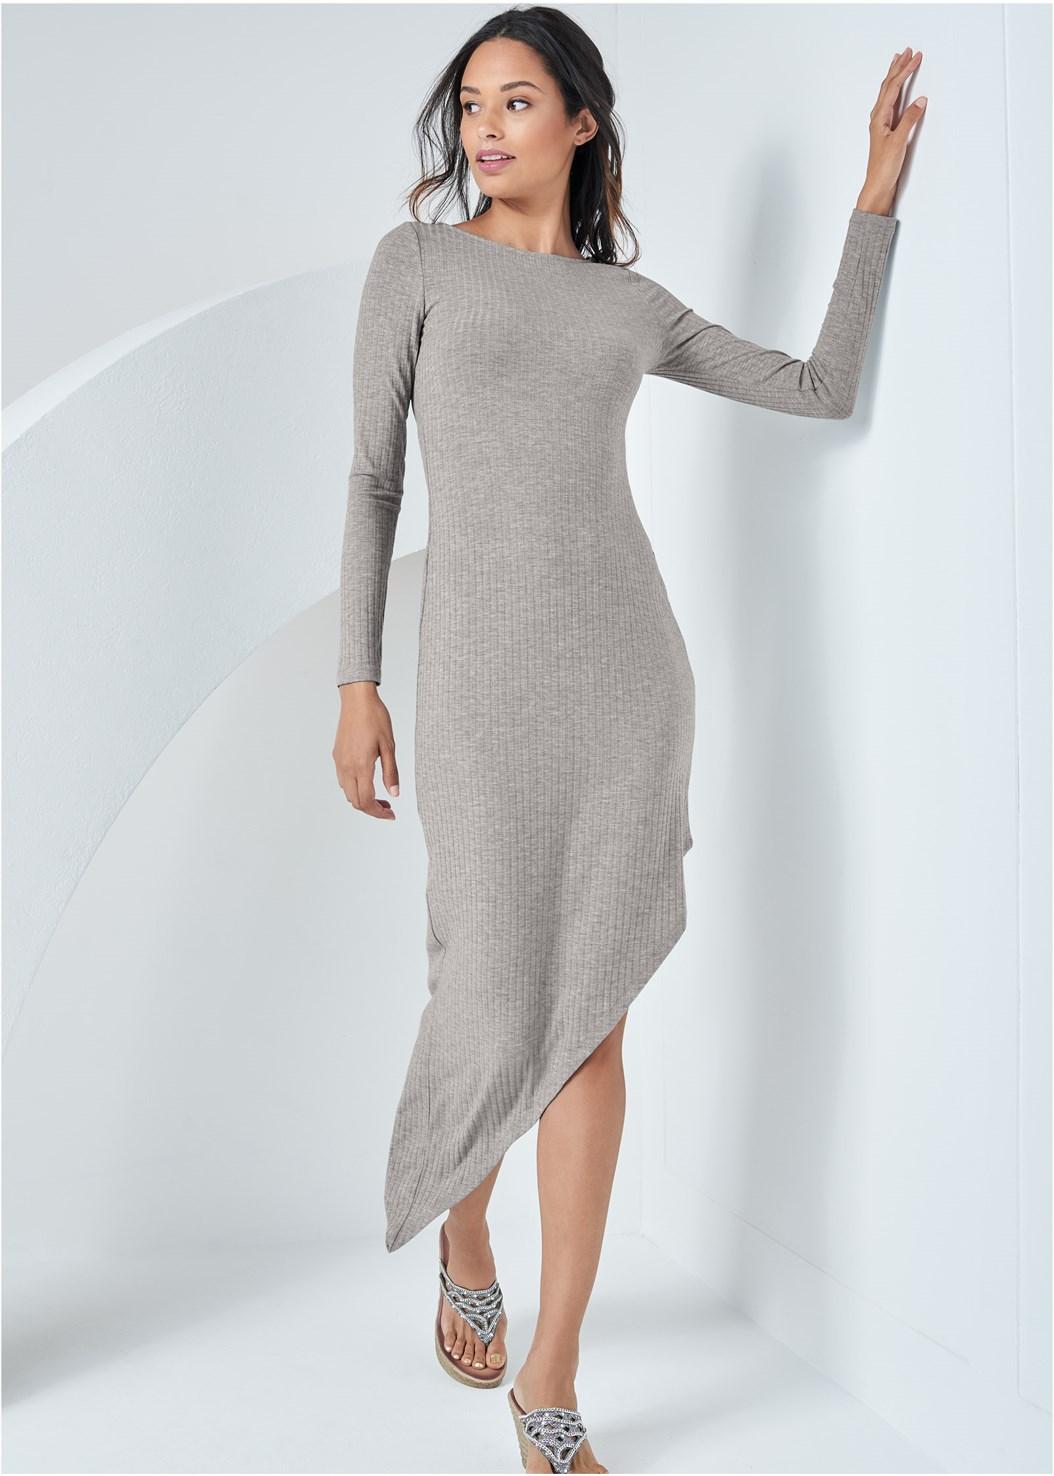 Asymmetrical Ribbed Dress,Embellished Wedges